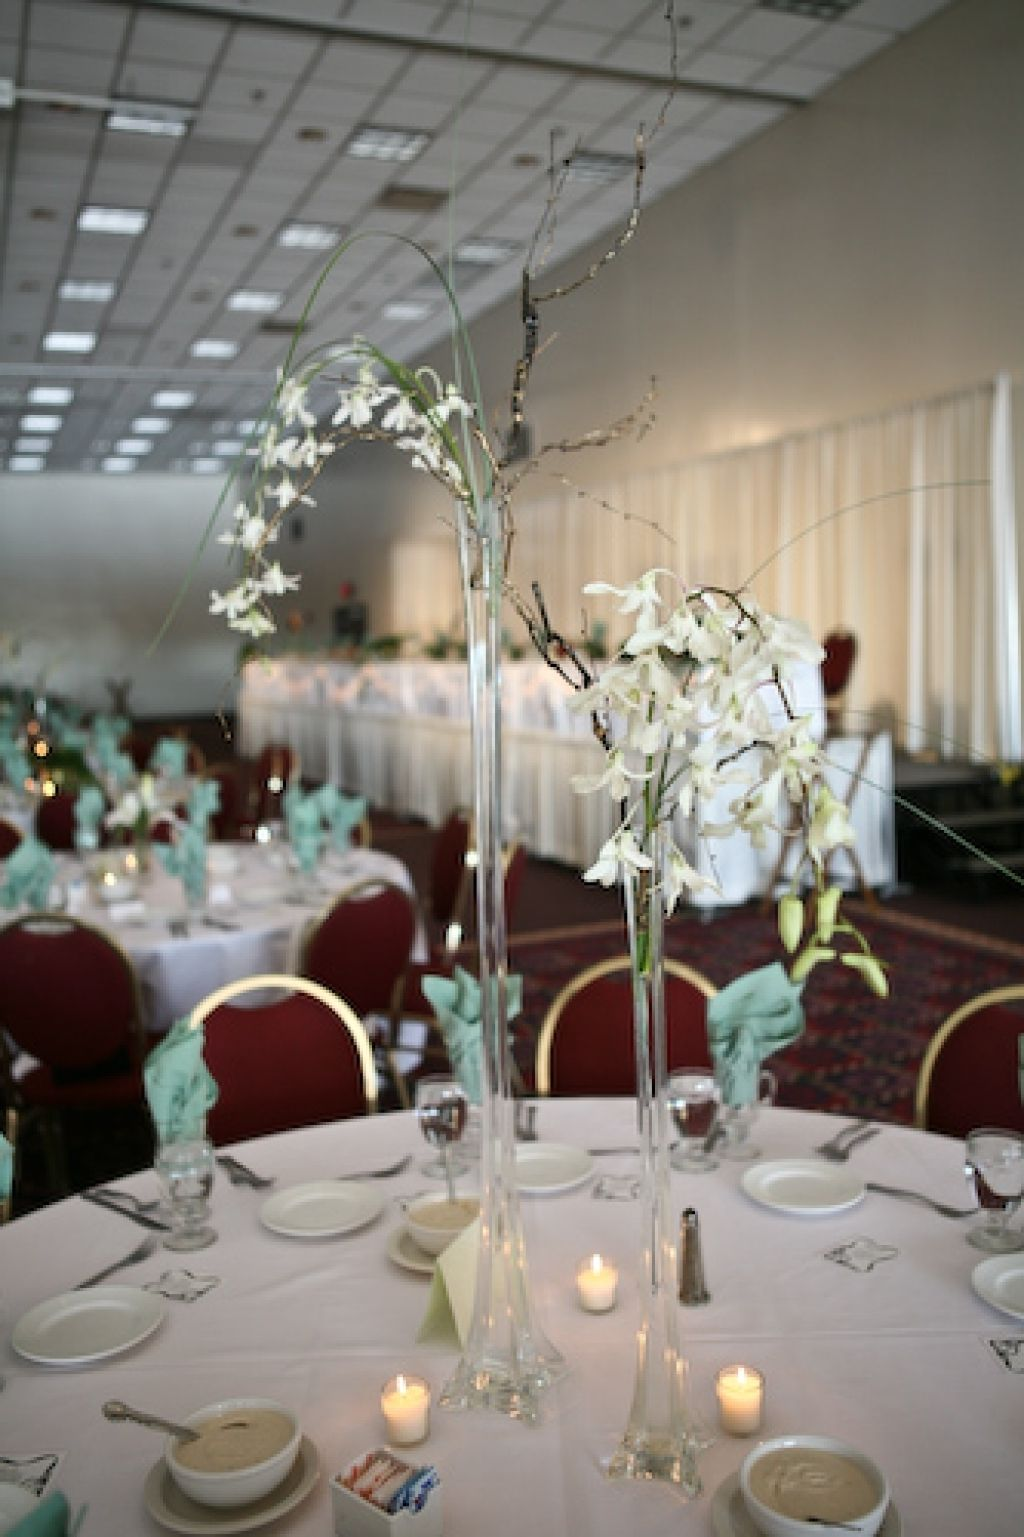 Wedding Decor Cheap Romantic Decoration Discount Wedding Supplies And Decorations Cheap Wedding Decorations Cheap Wedding Supplies Wedding Decorations